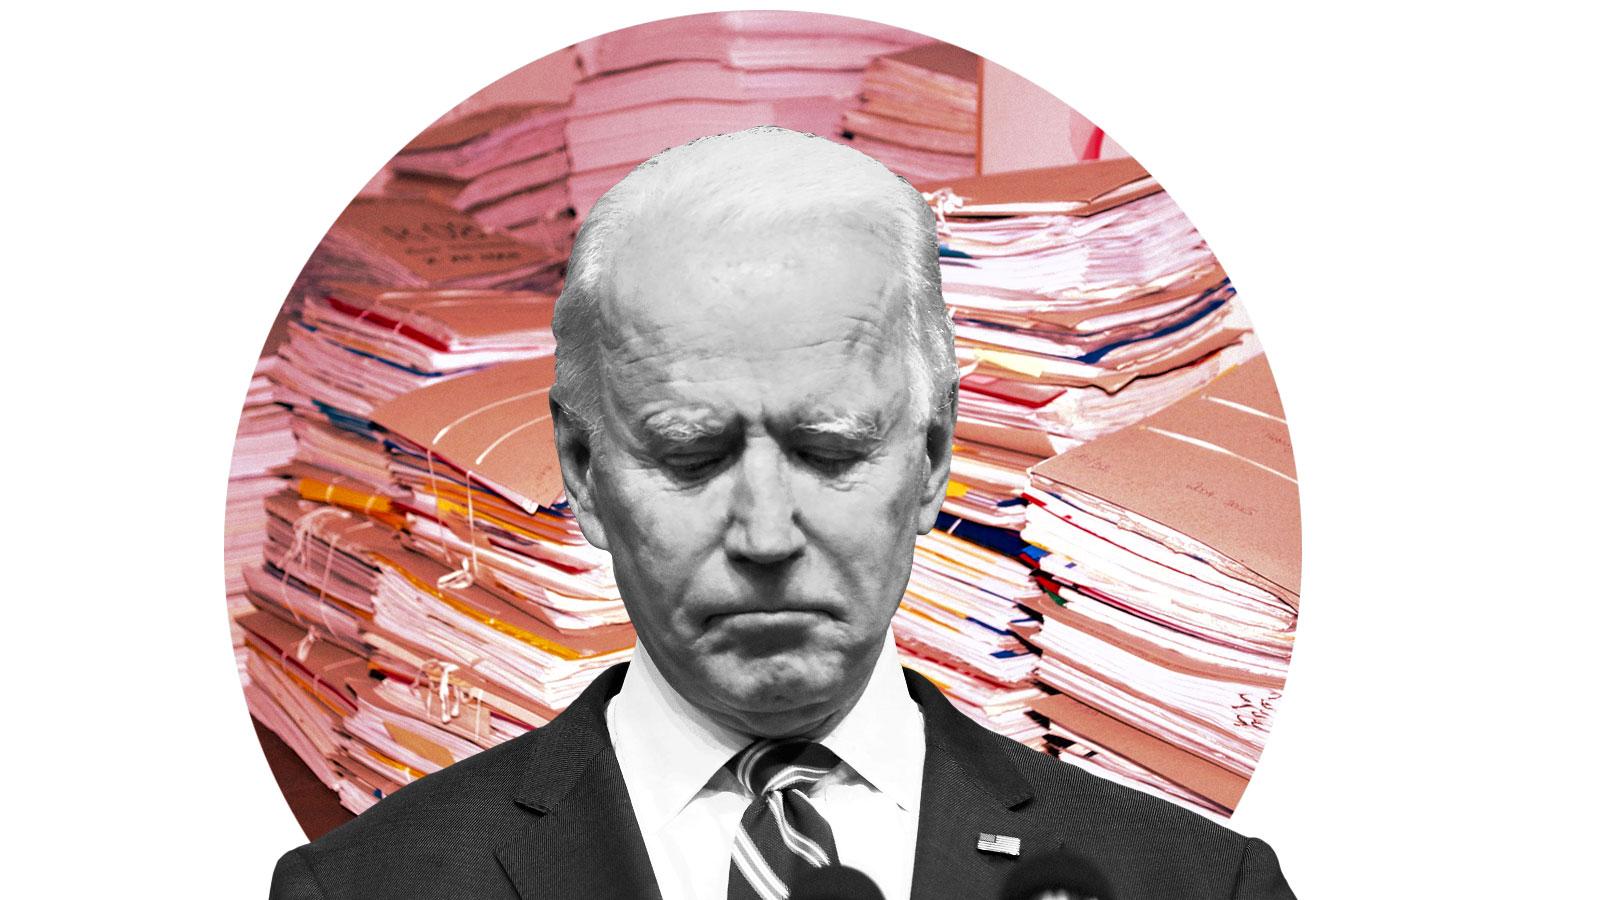 Joe Biden looking regretful in front of a circular image of stacks of files